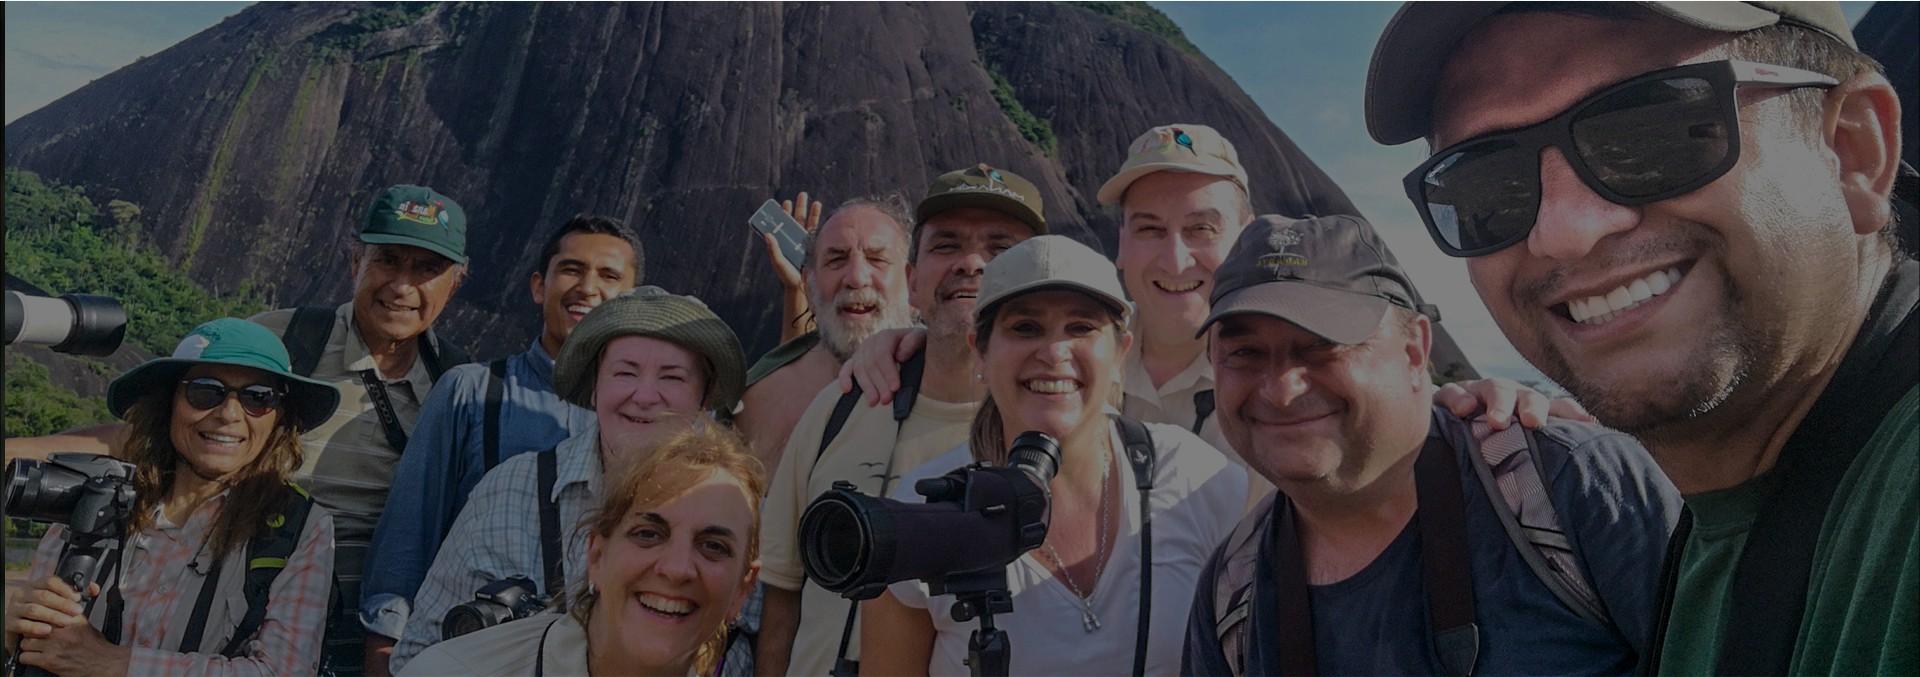 Banner Clients Manakin Nature Tours